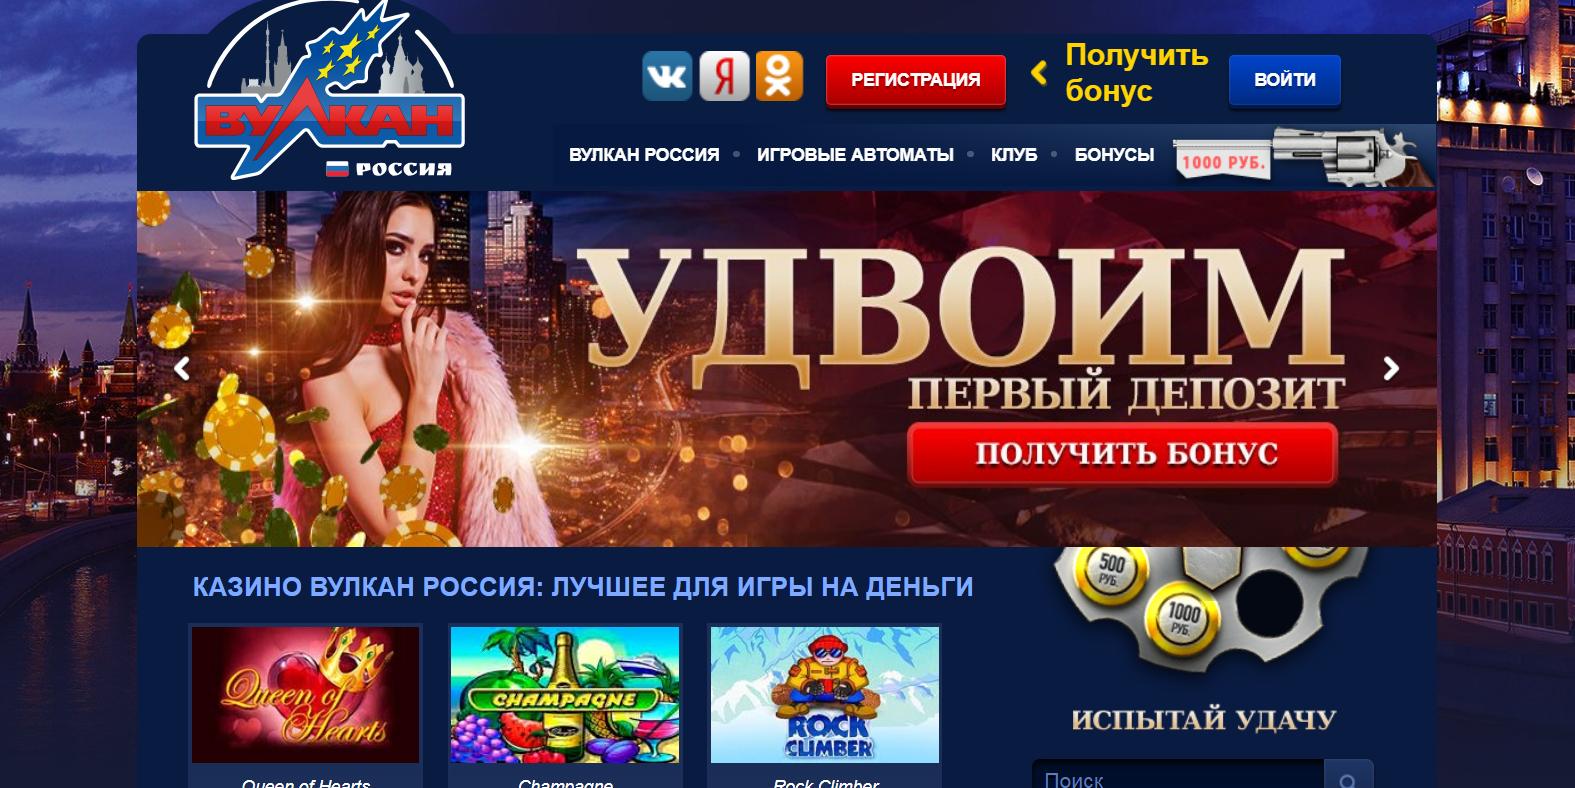 бонусы казино вулкан россия